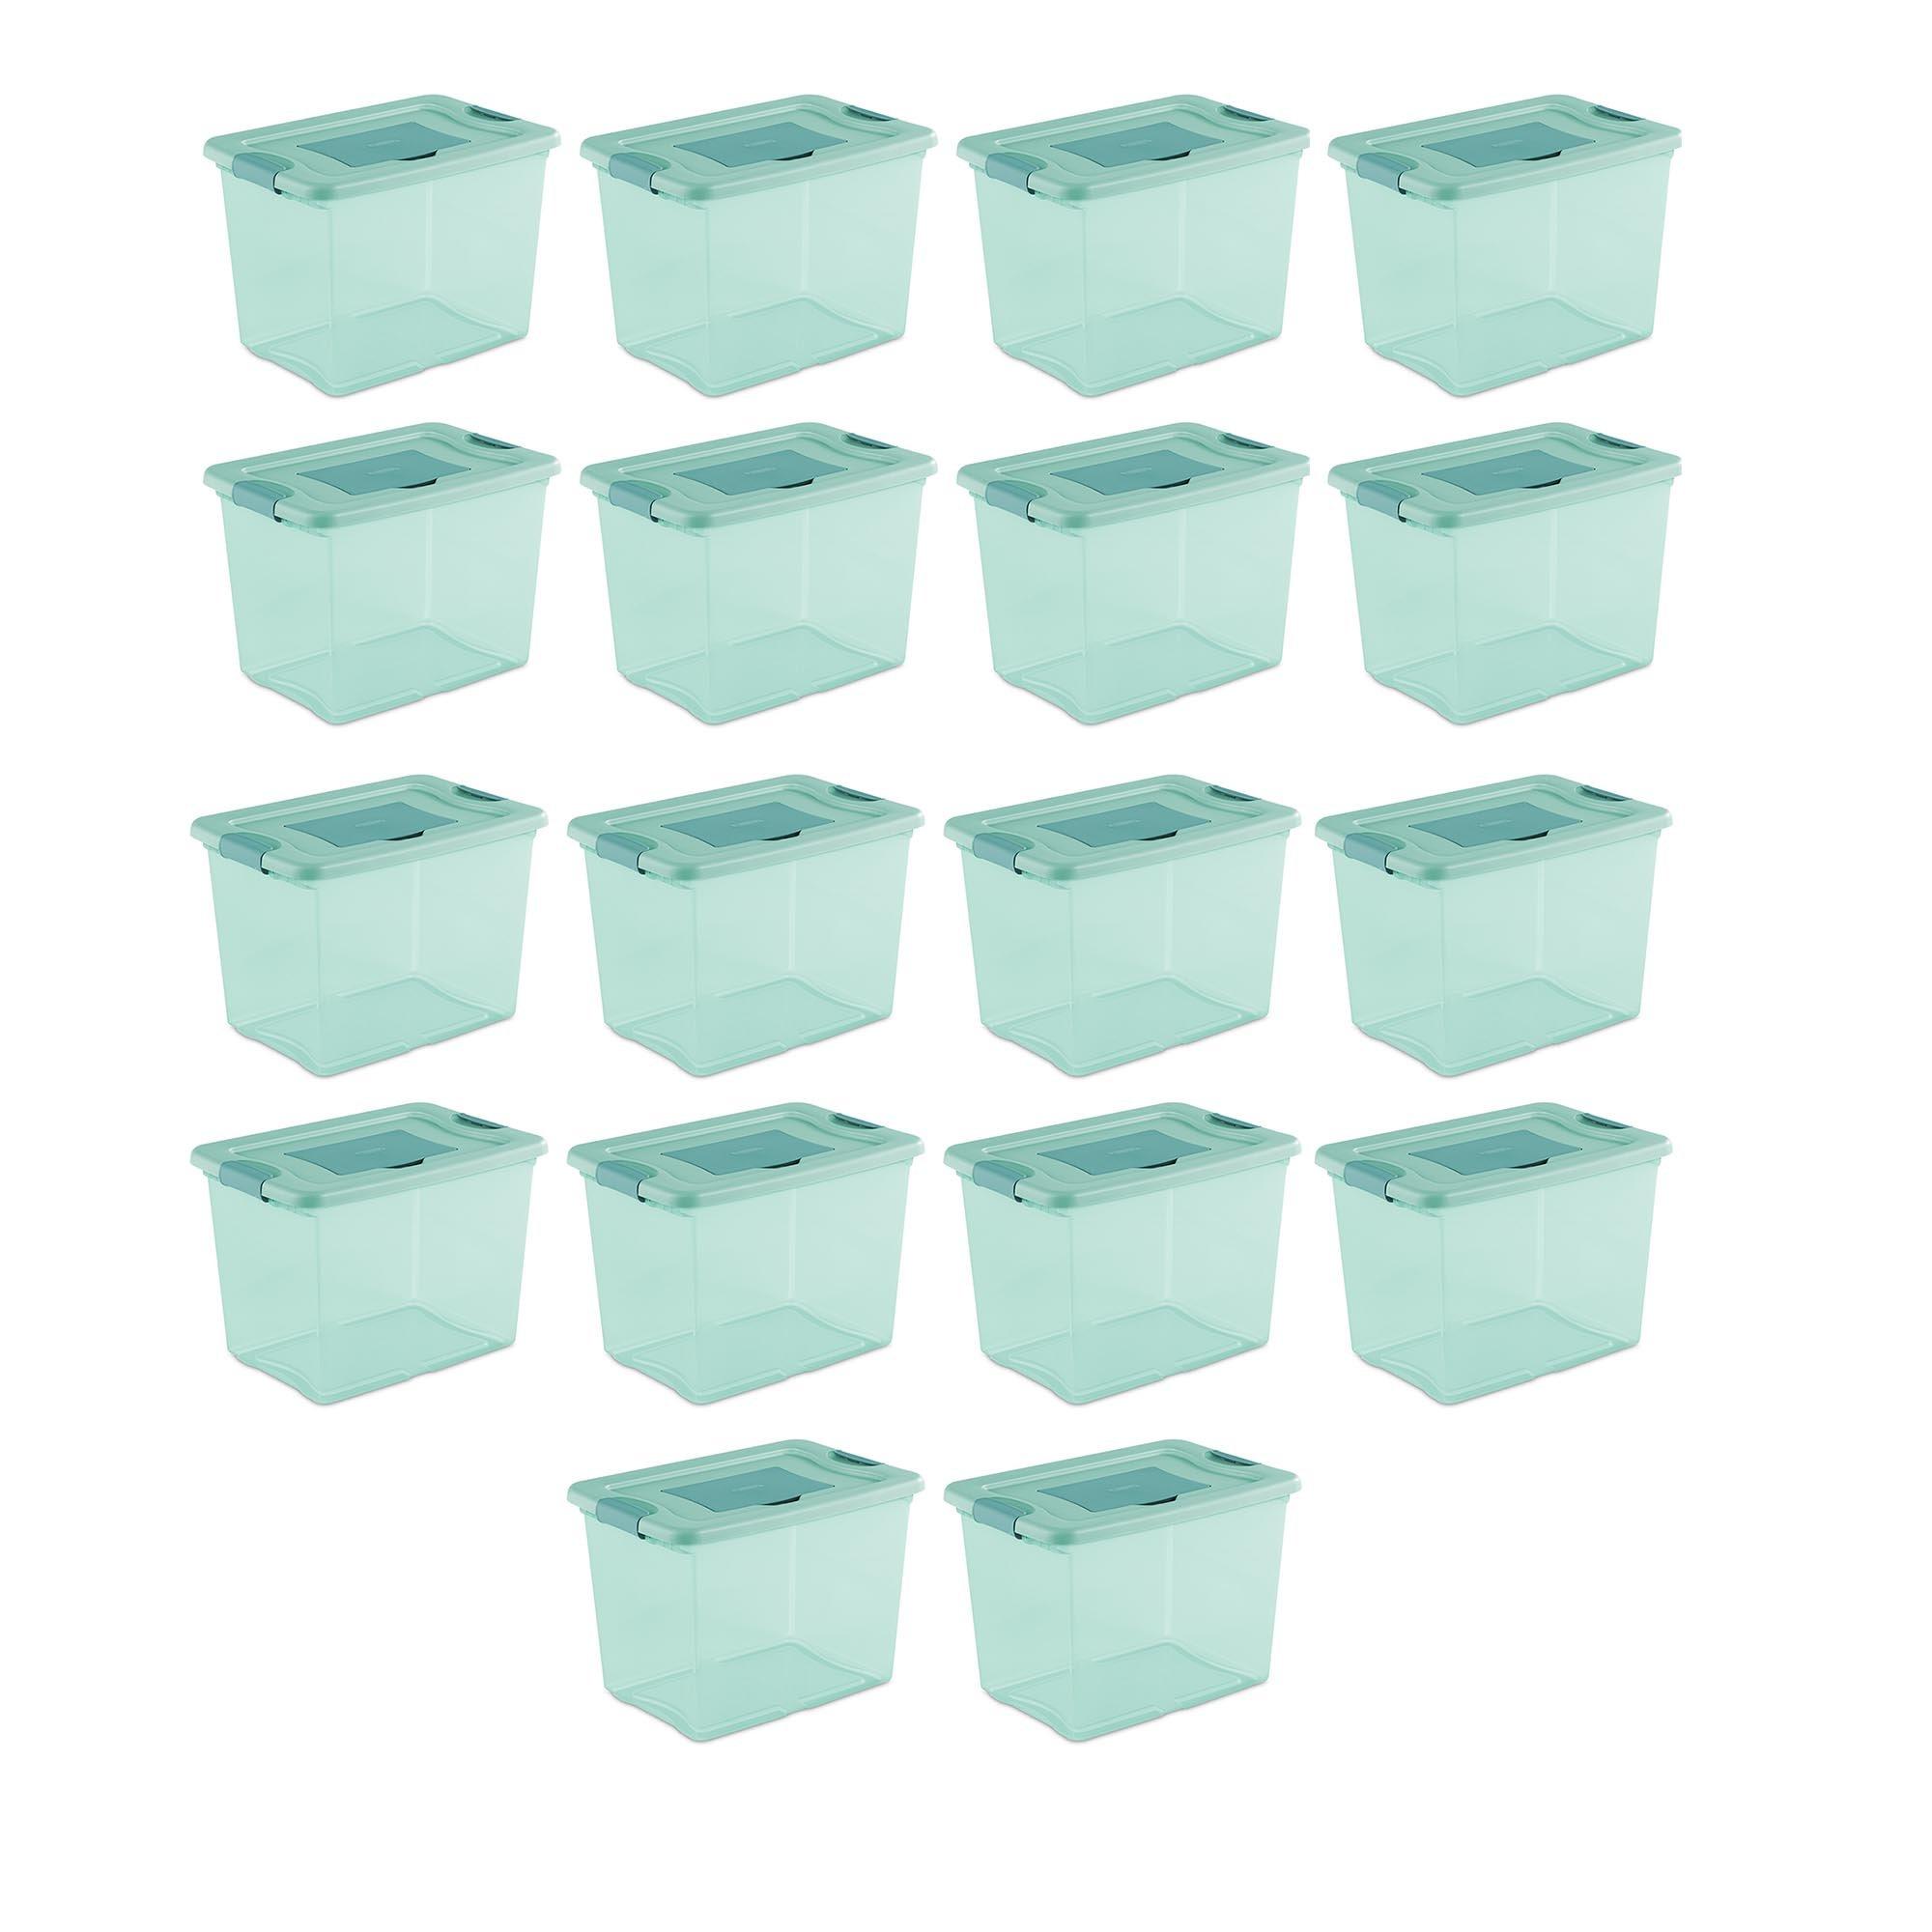 Sterilite 25 Quart Fresh Scent Stackable Plastic Storage Box Container (18 Pack)